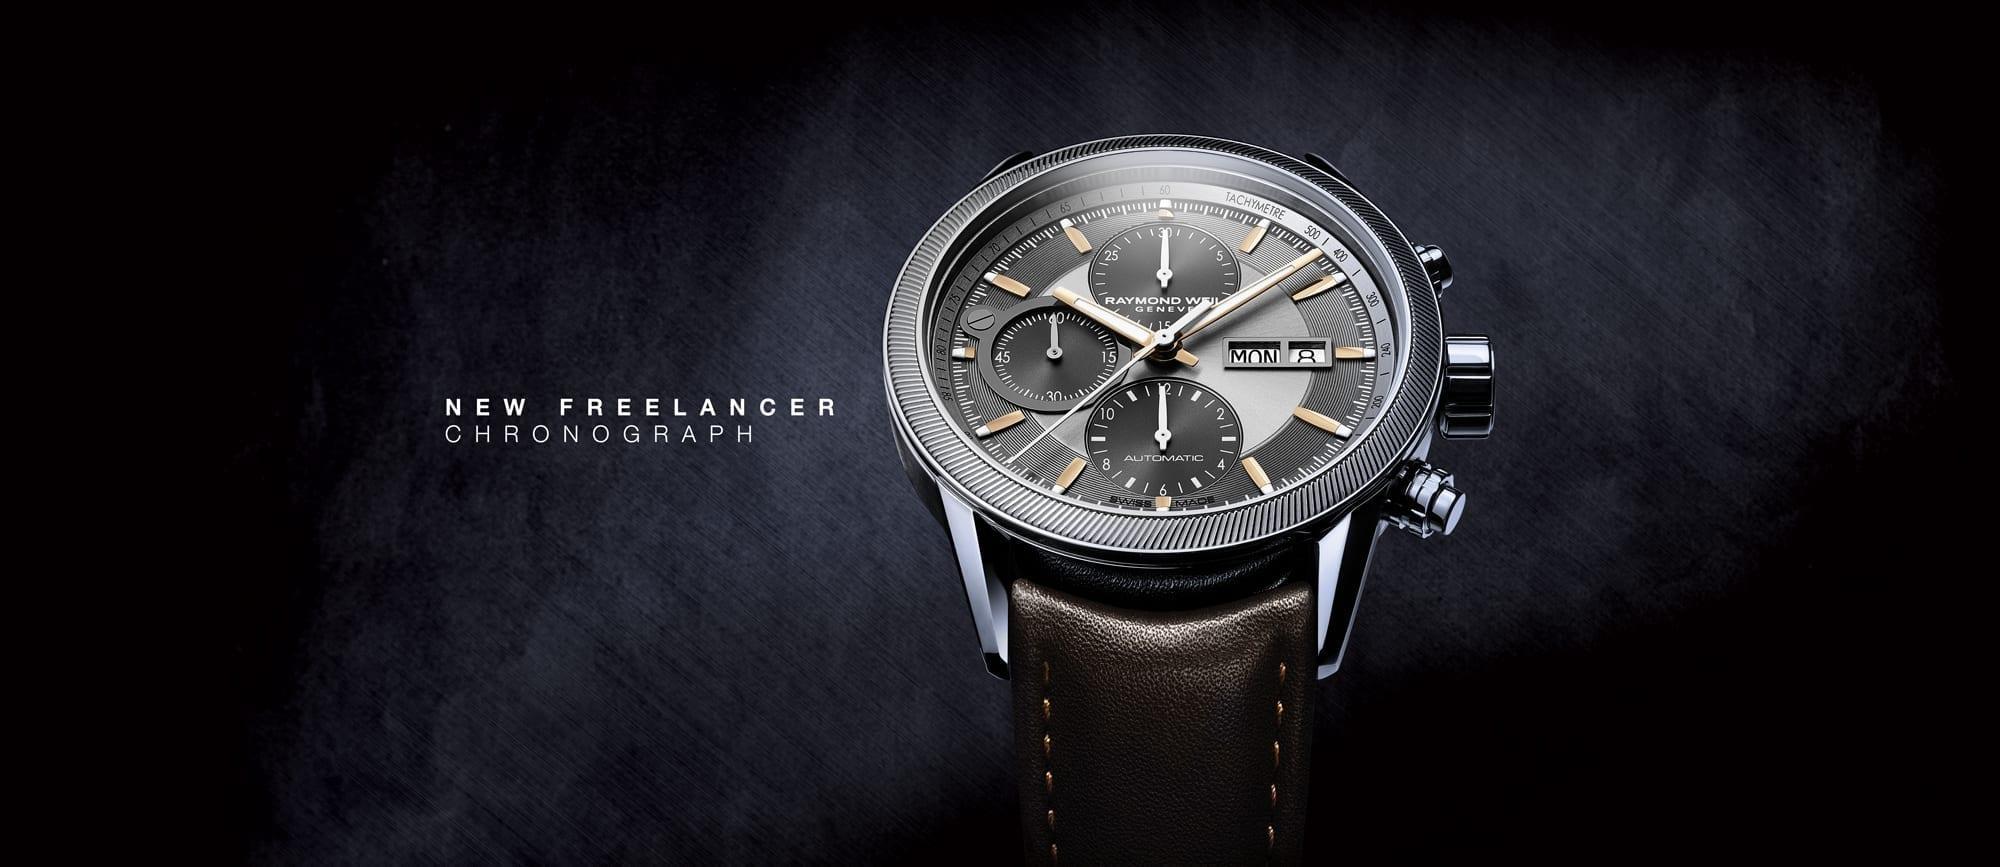 7731 freelancer chronograph ad